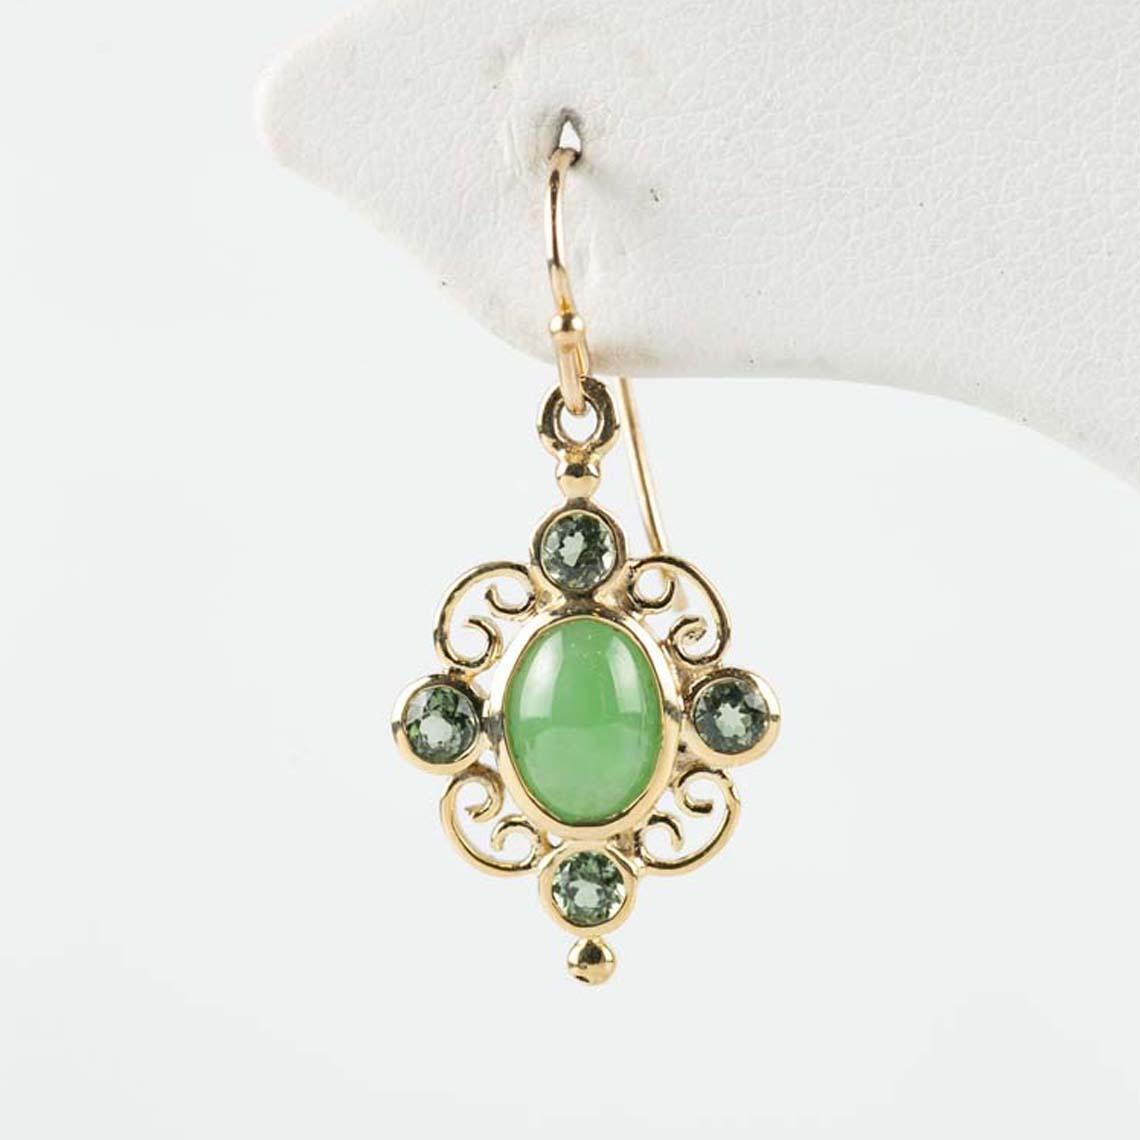 Jade and tourmaline earrings